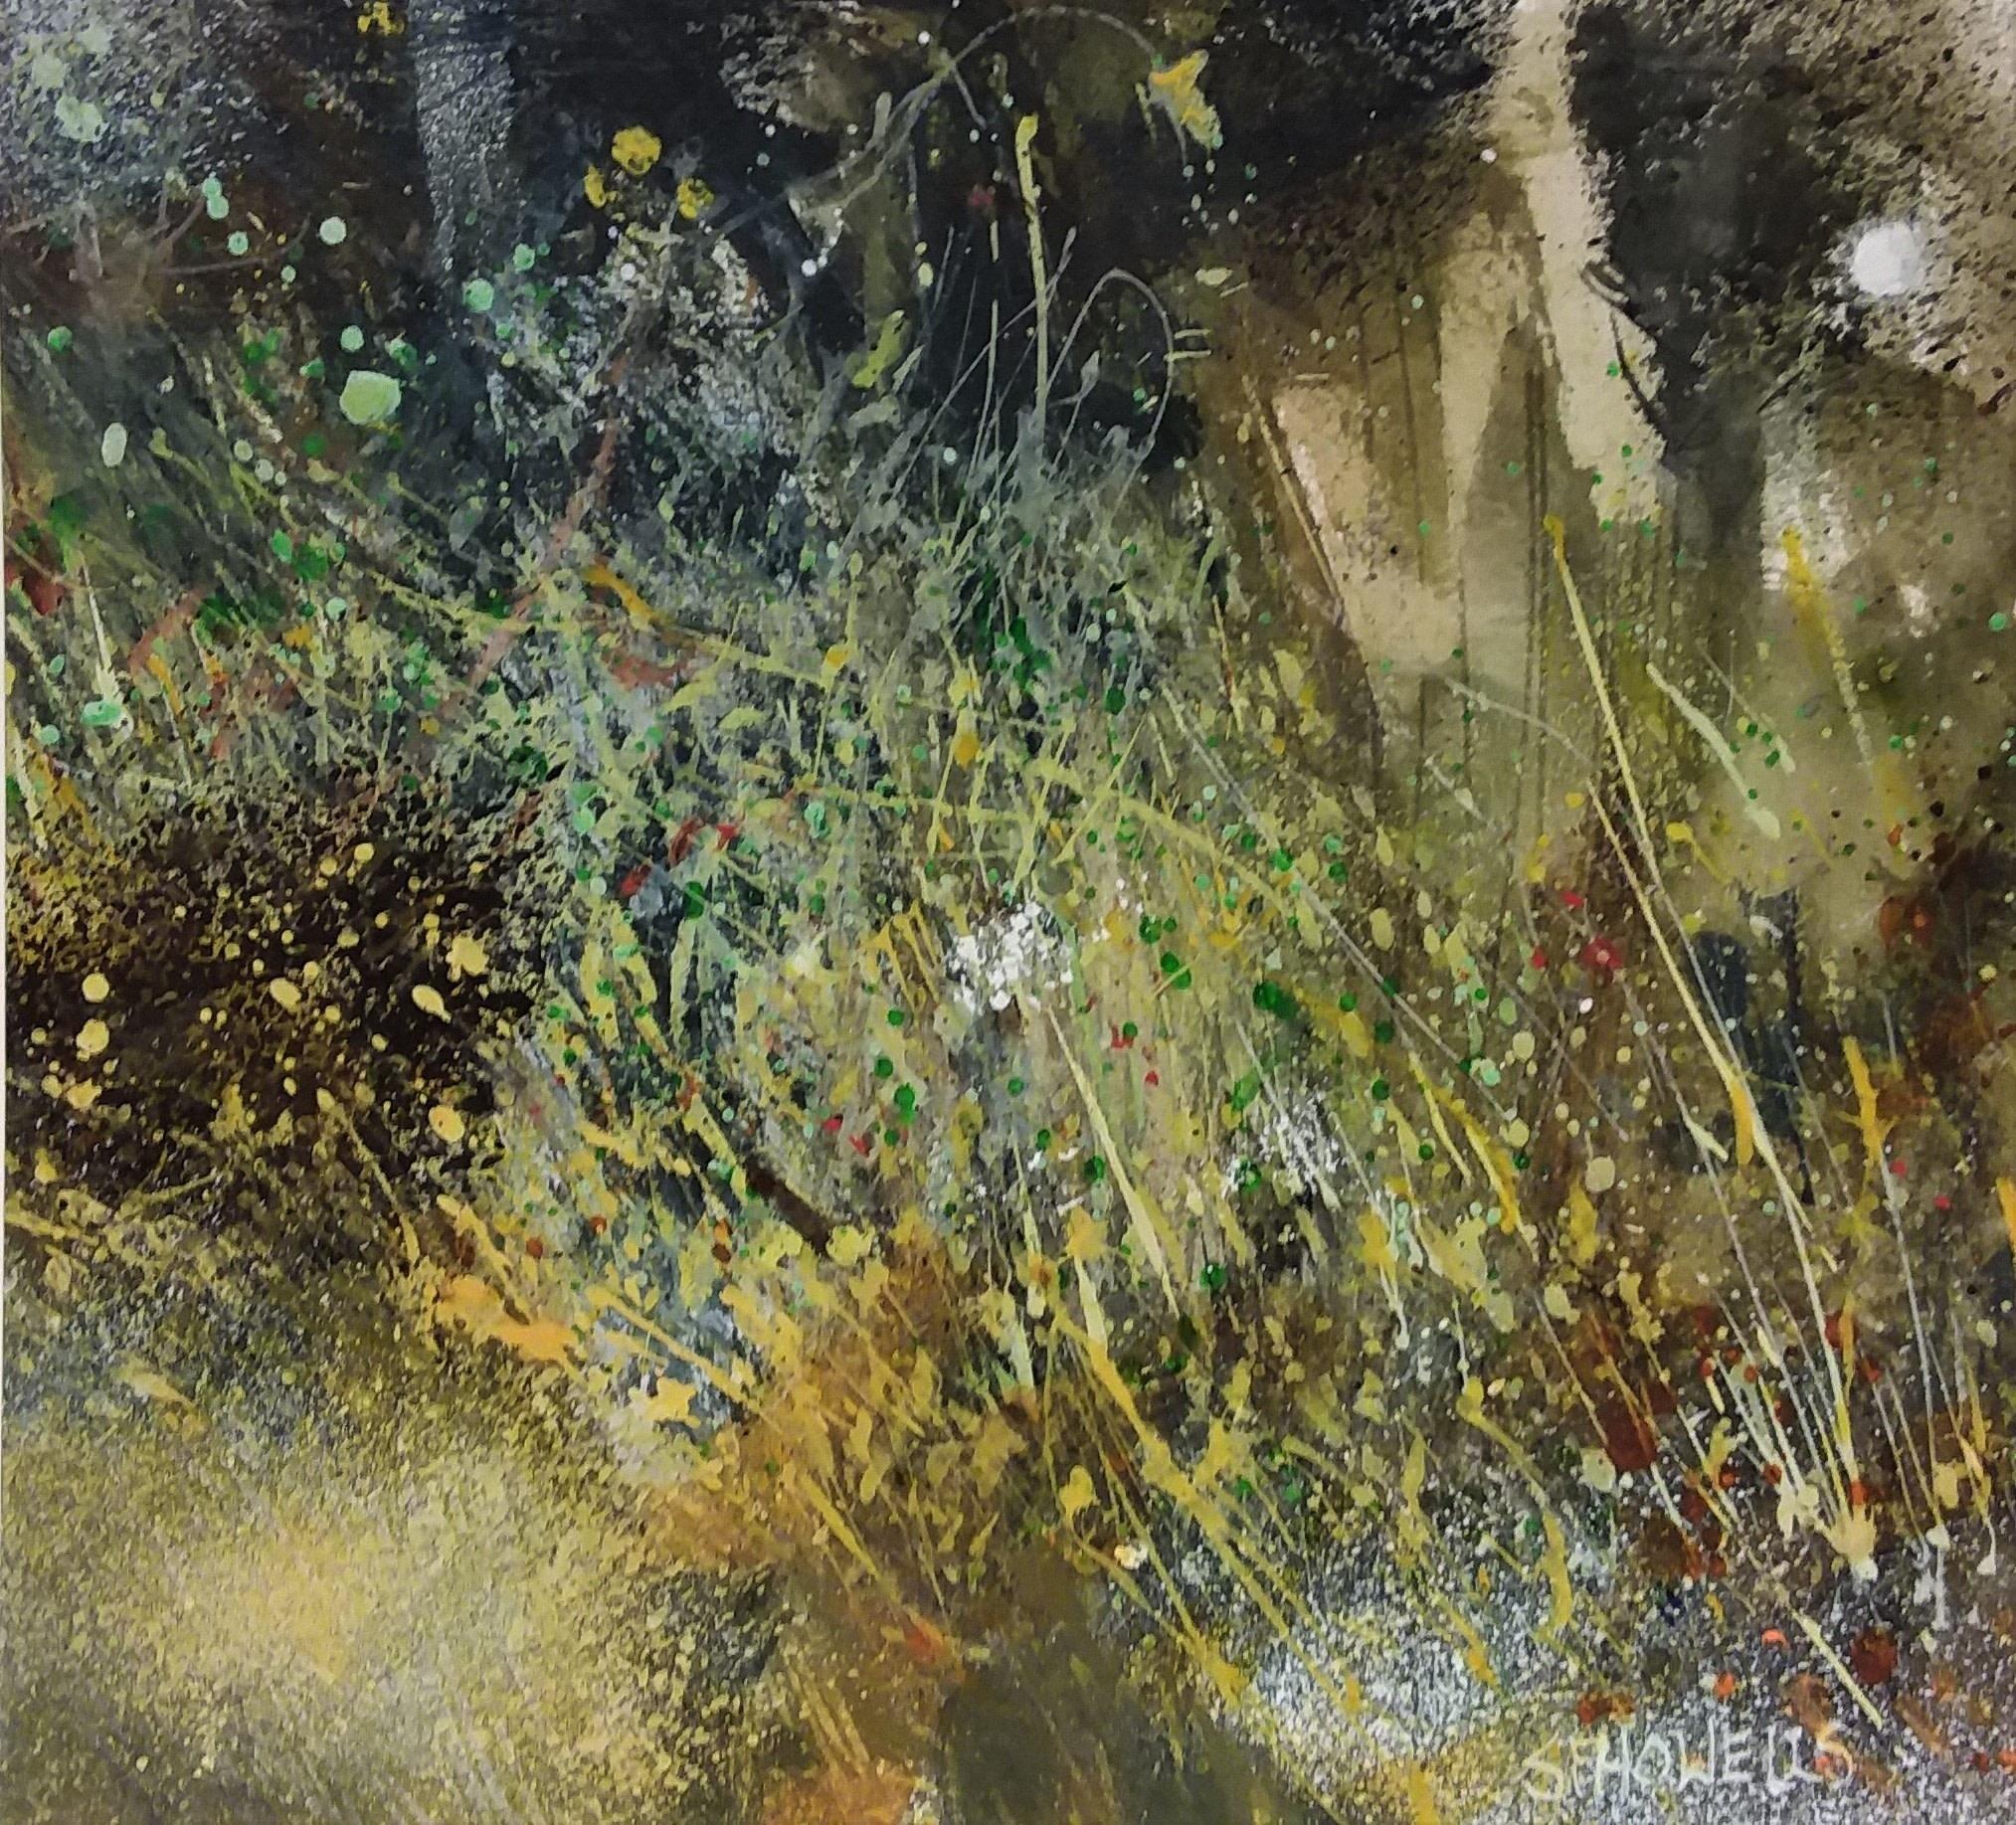 <span class=&#34;link fancybox-details-link&#34;><a href=&#34;/exhibitions/24/works/artworks_standalone10715/&#34;>View Detail Page</a></span><div class=&#34;artist&#34;><span class=&#34;artist&#34;><strong>Sue Howells</strong></span></div><div class=&#34;title&#34;><em>Signs of Spring</em></div><div class=&#34;medium&#34;>watercolour</div><div class=&#34;dimensions&#34;>48 x 47cm</div>